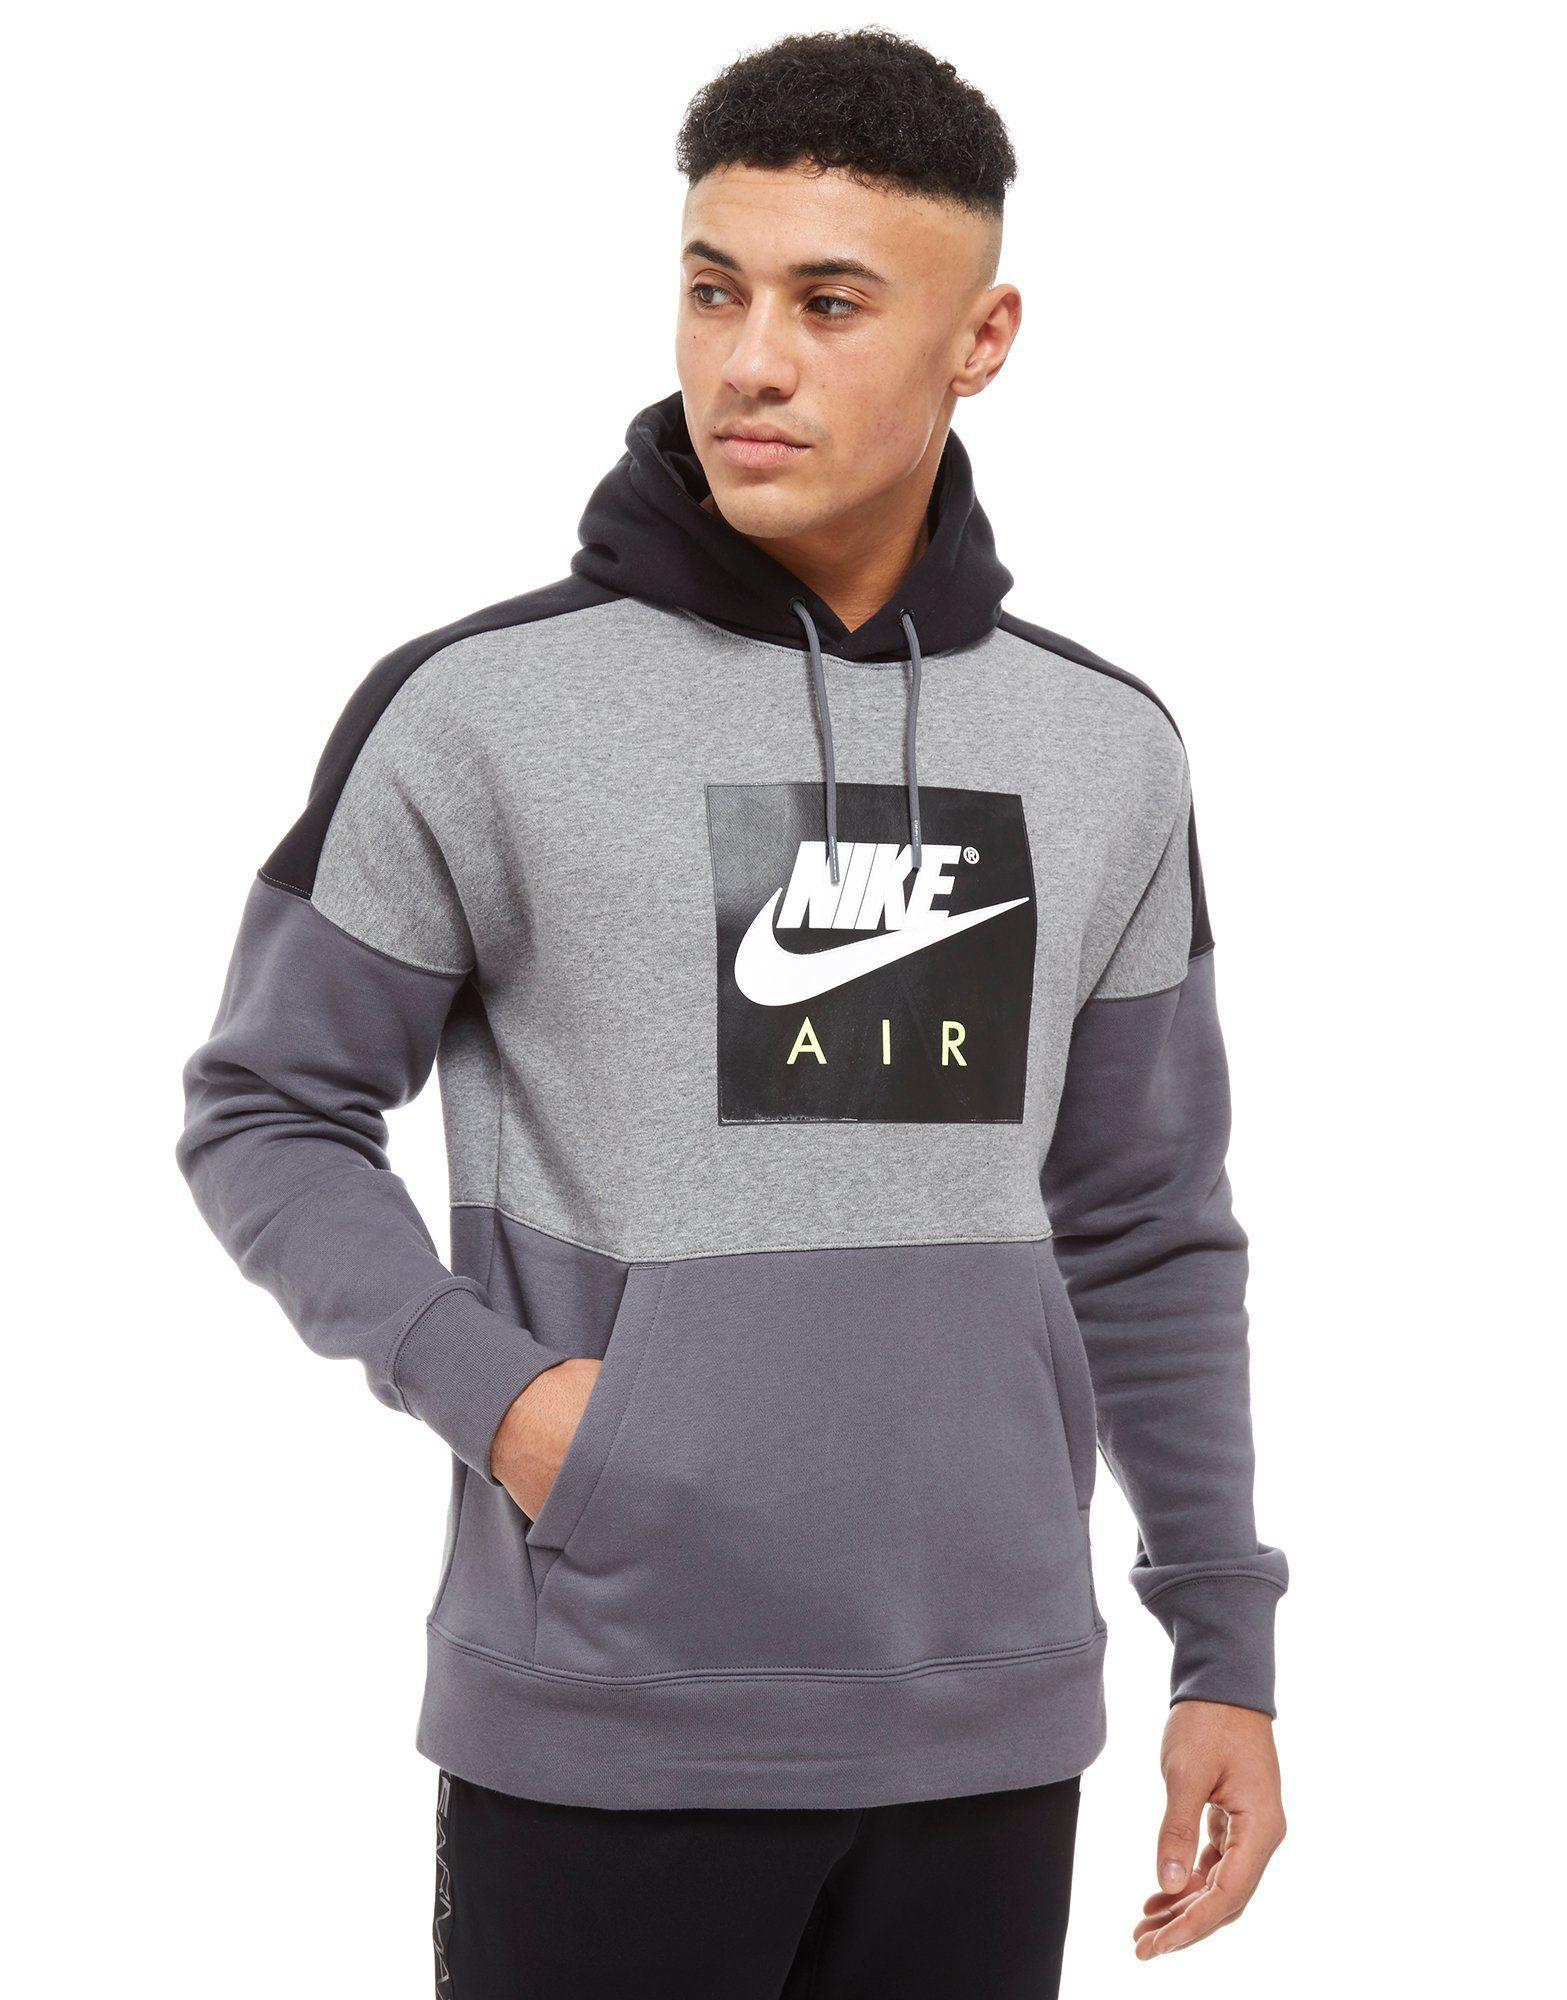 Nike Air Overhead Colourblock Hoodie